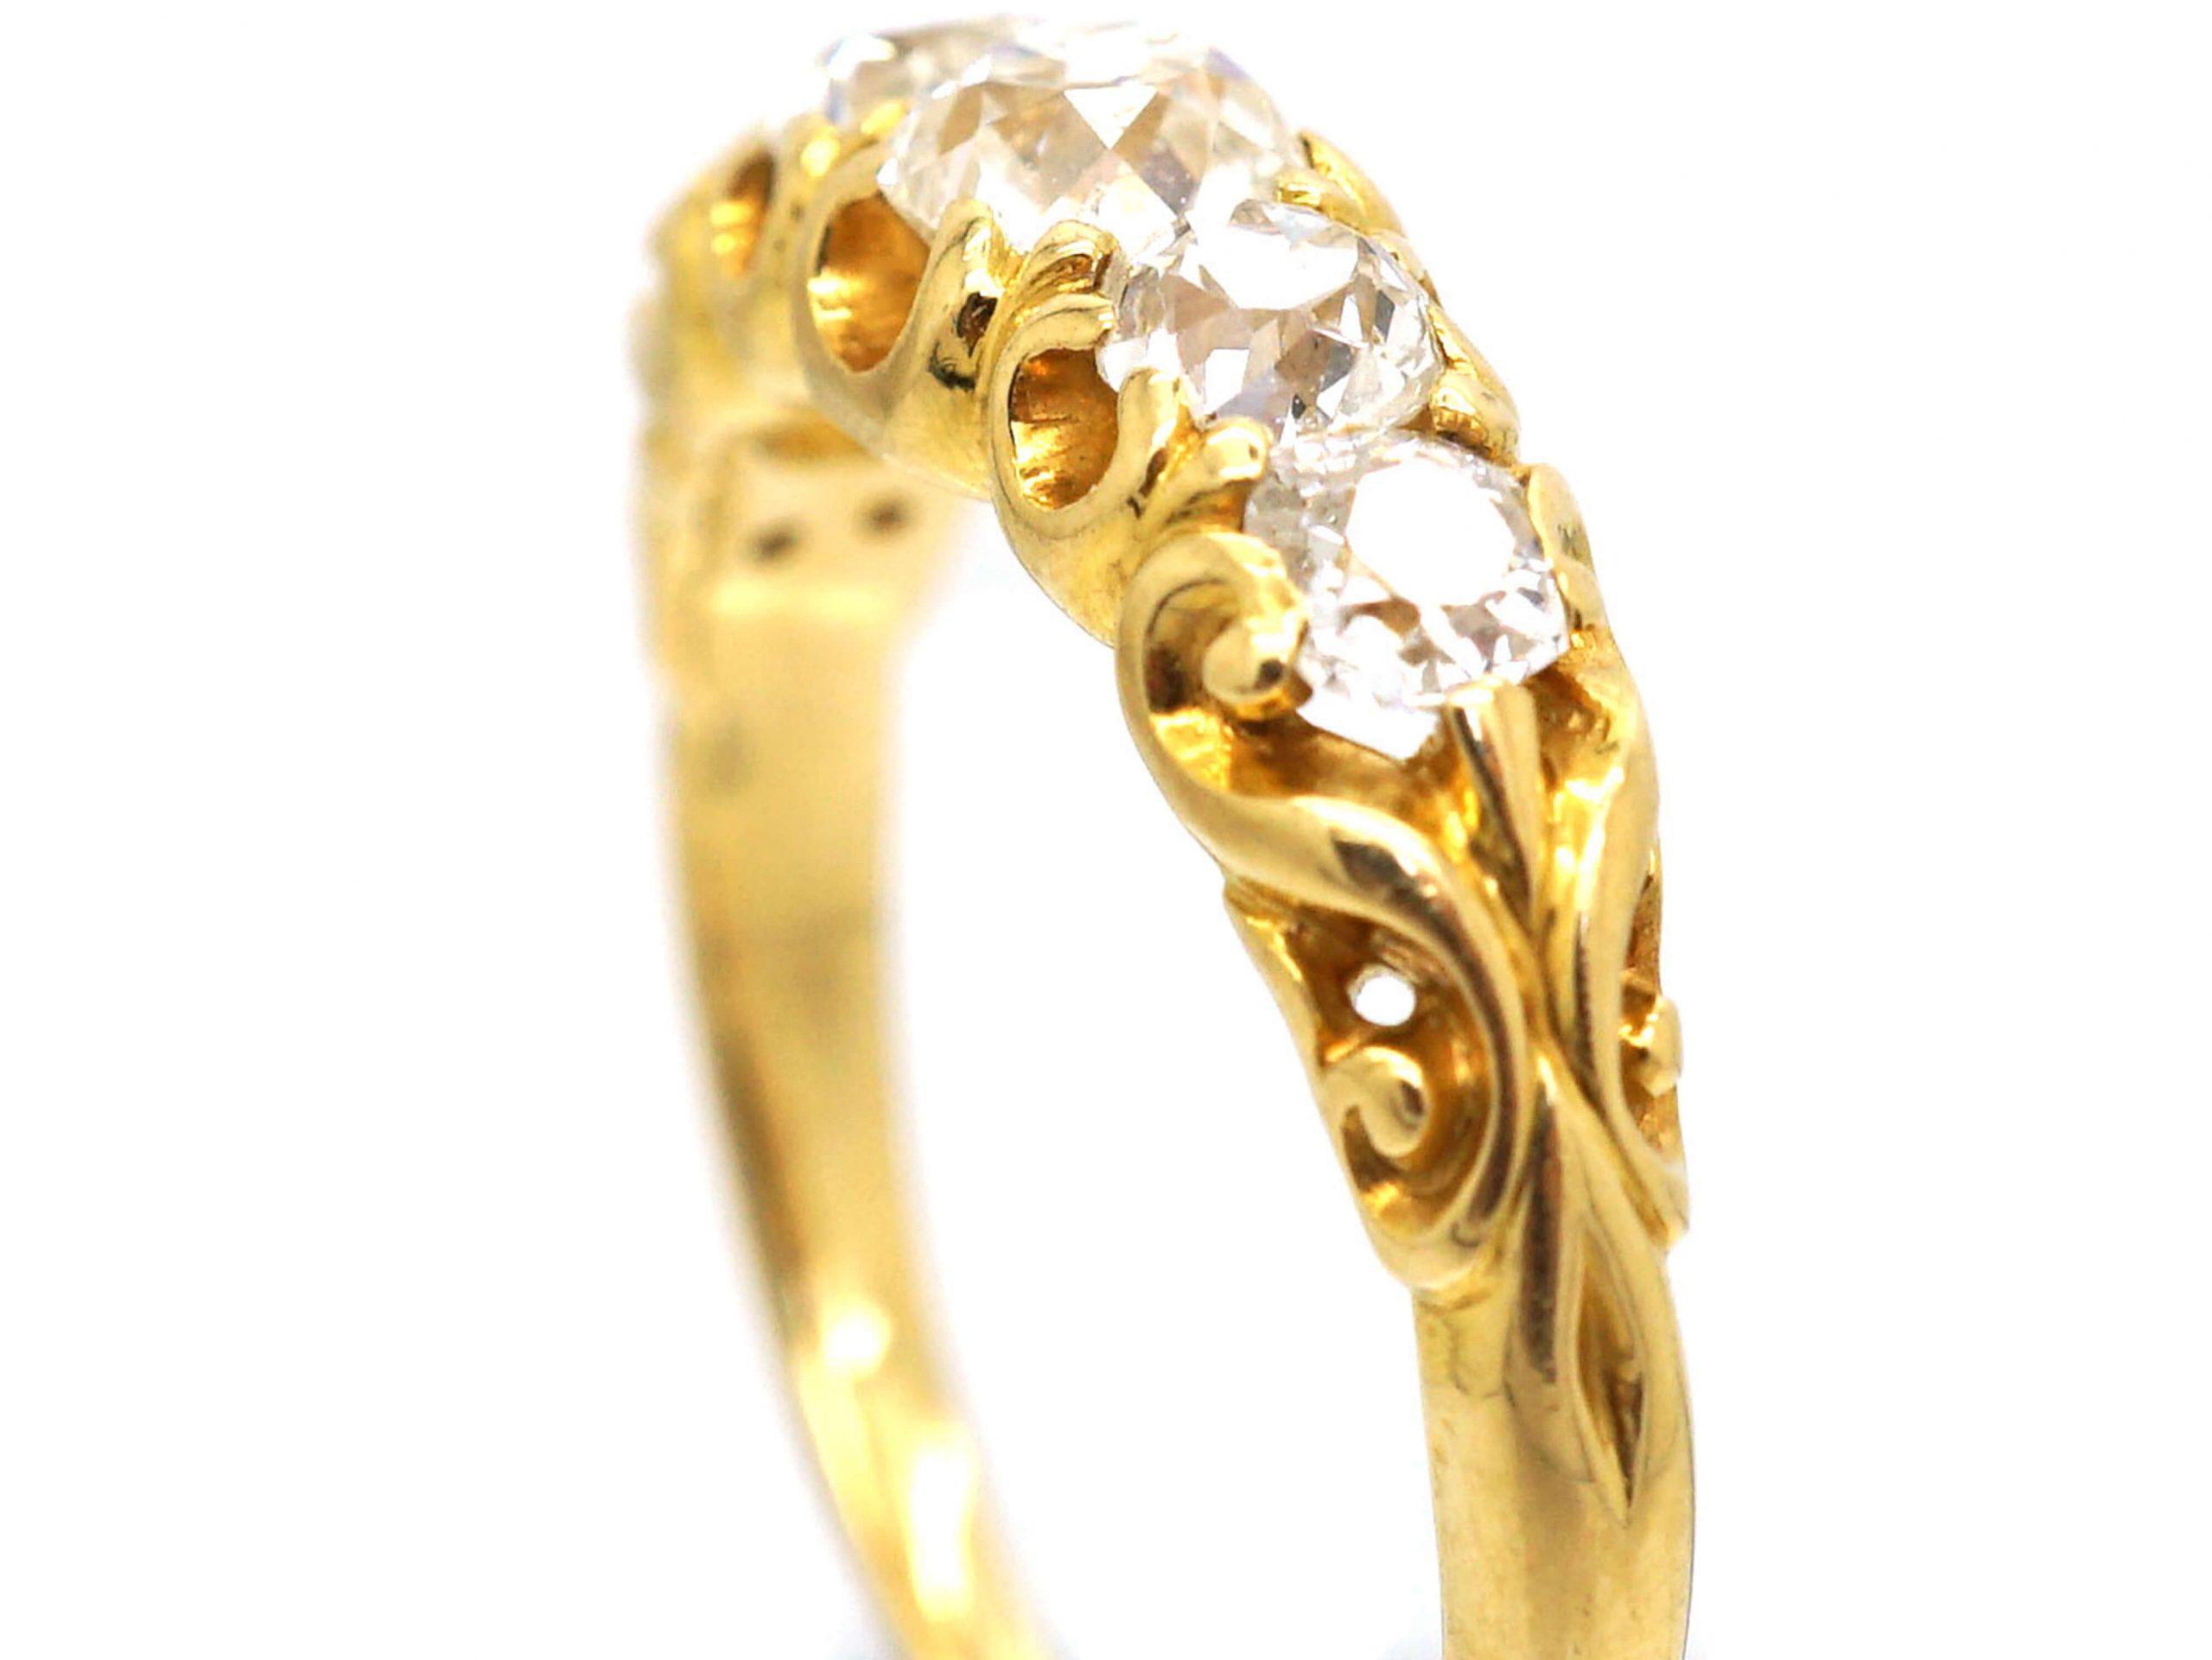 Victorian 18ct Gold, Five Stone Old Mine Cut Diamond Ring